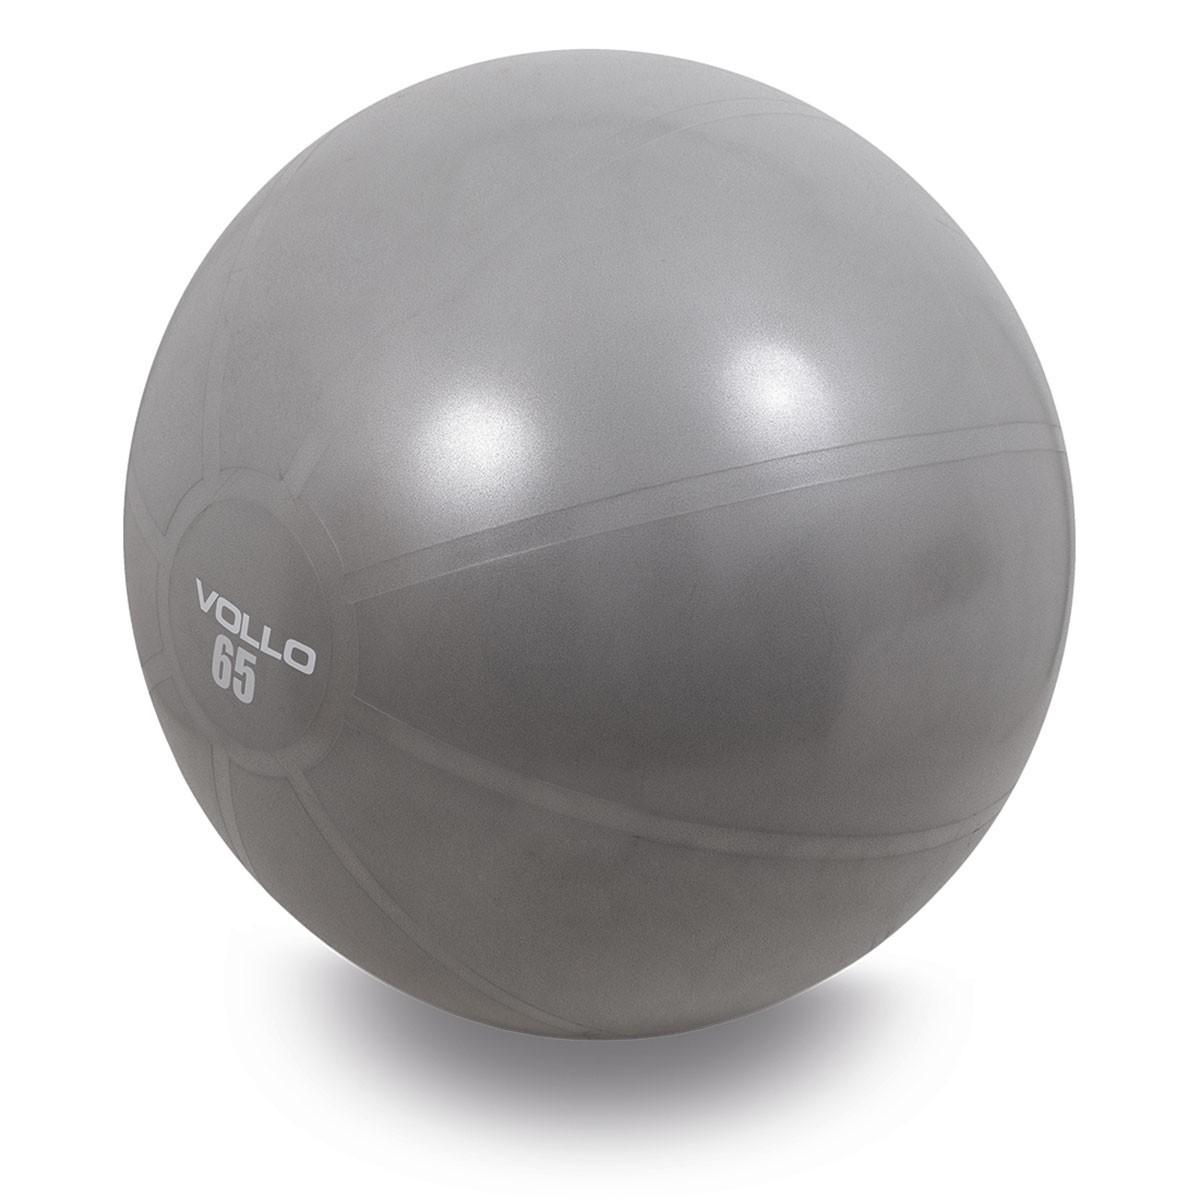 BOLA SUIÇA GYM BALL 65 CM CINZA COM BOMBA VOLLO